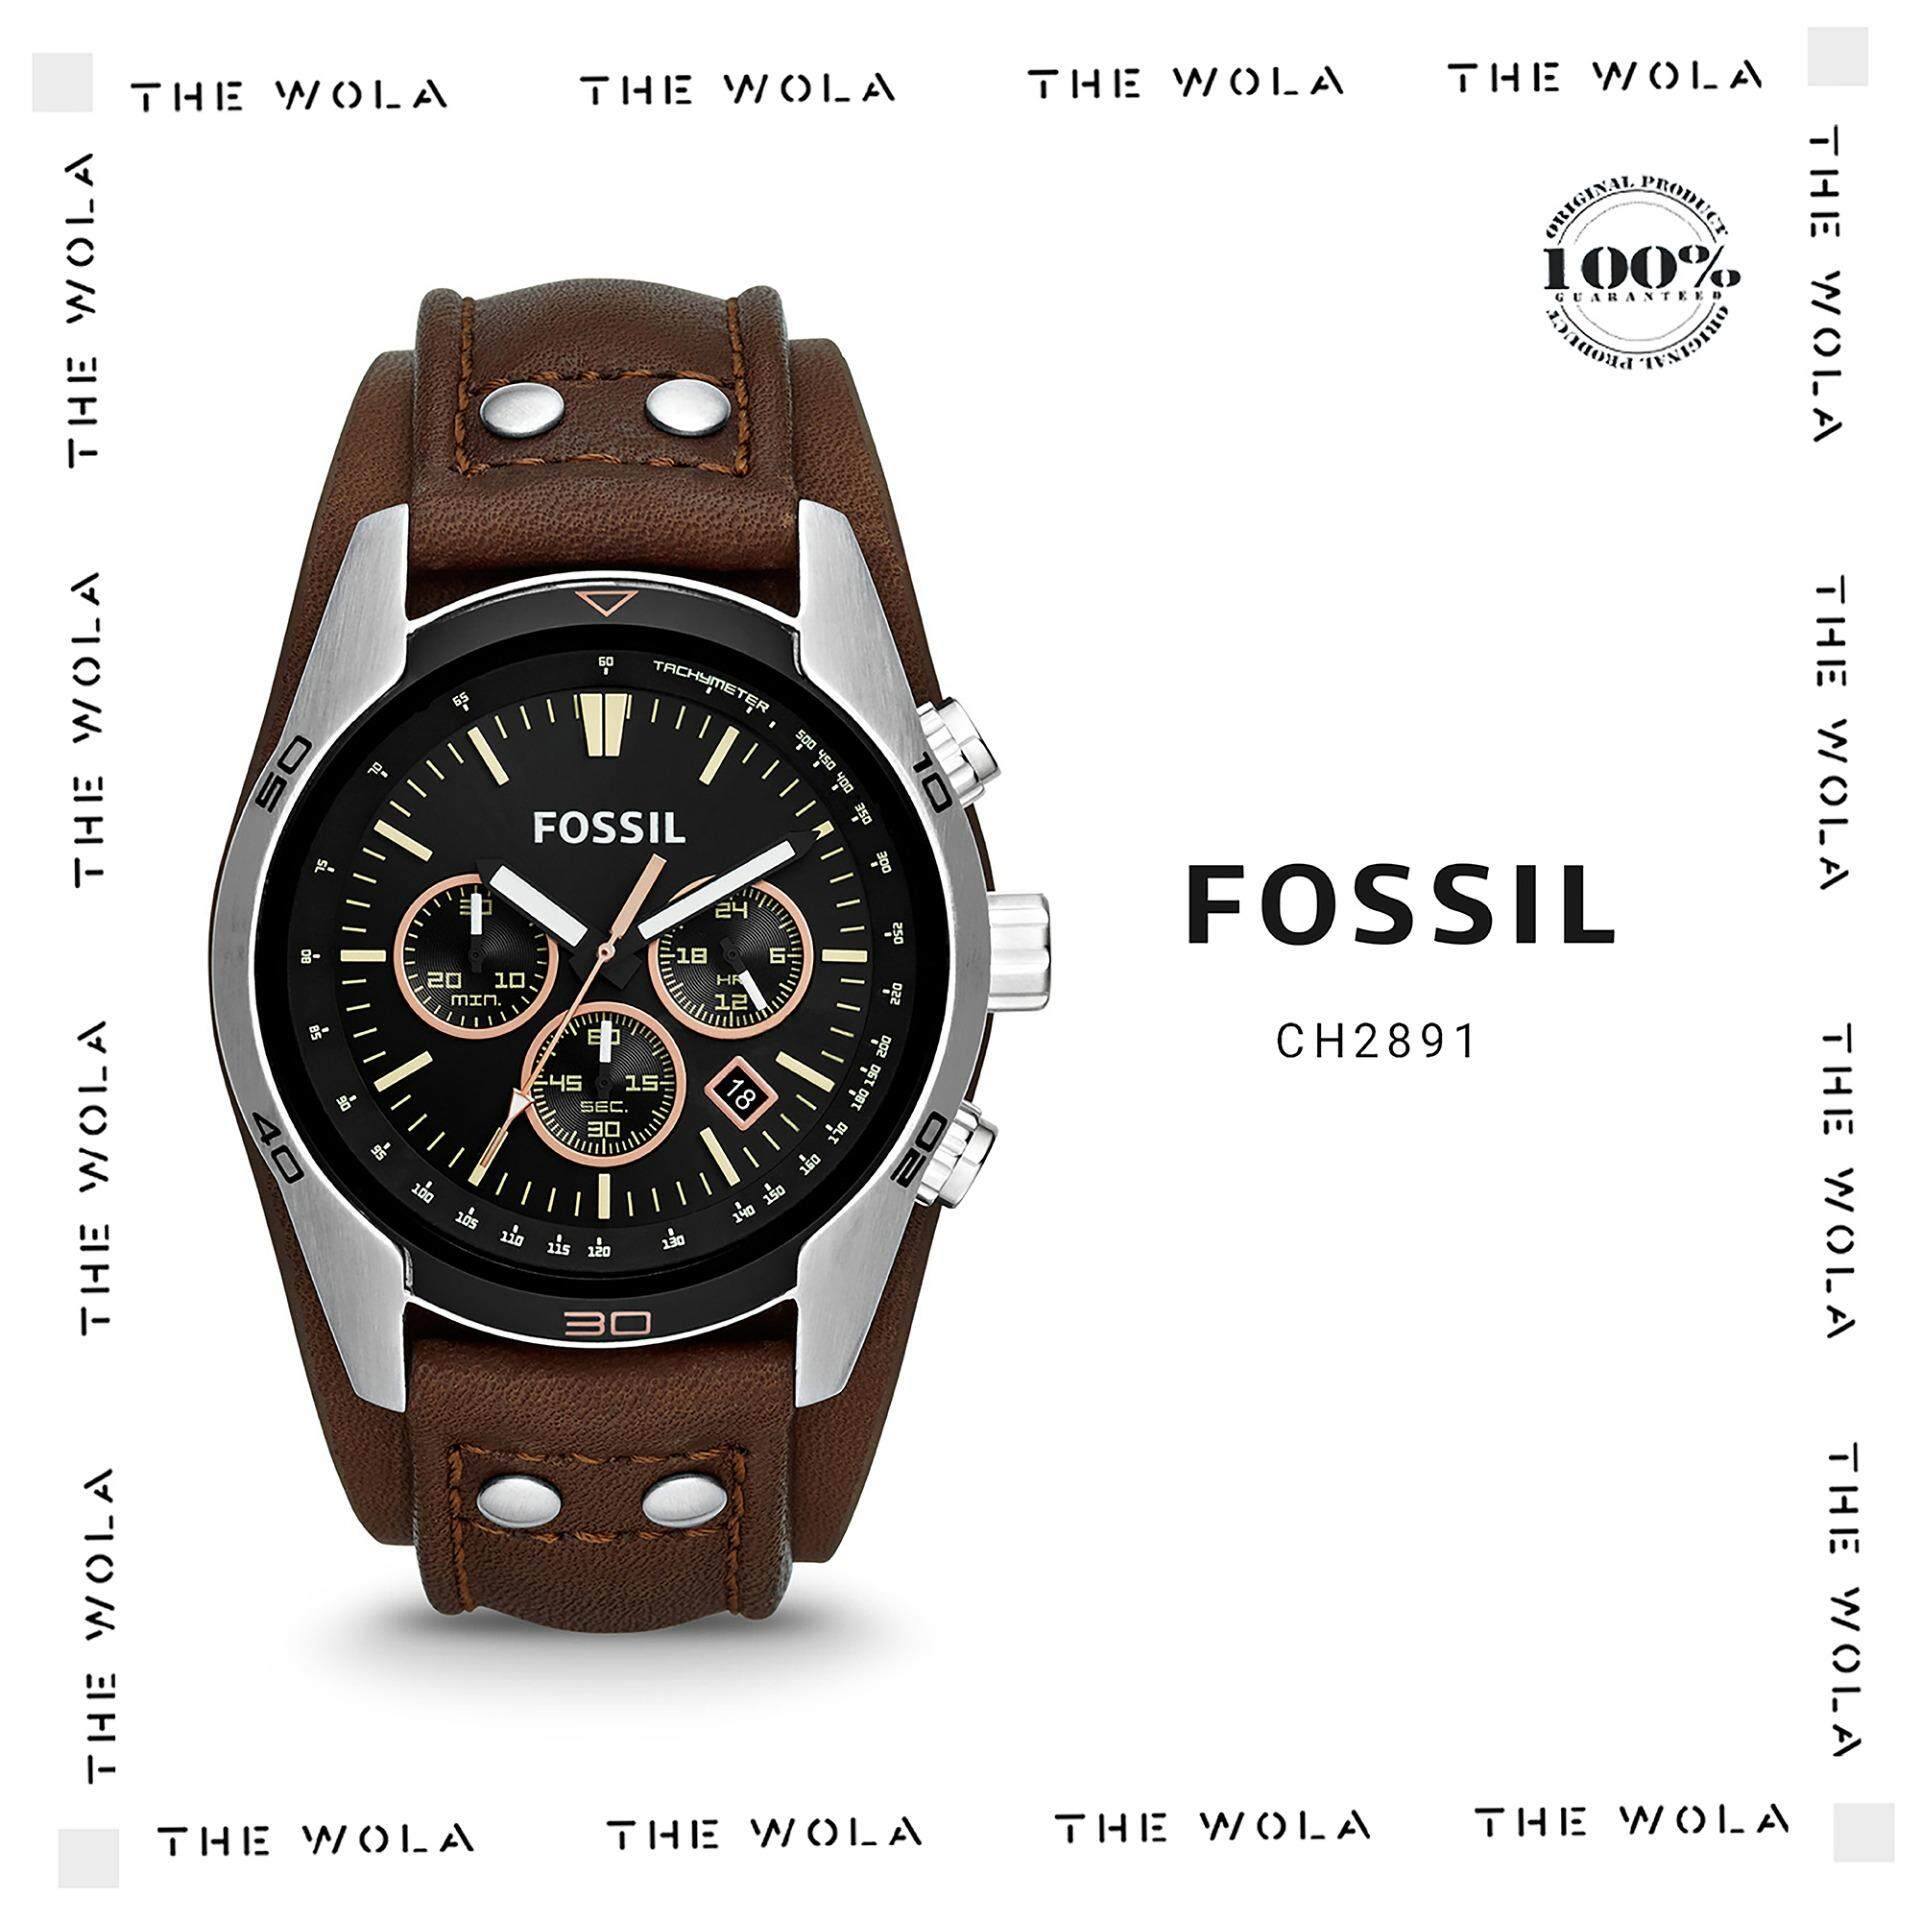 Fossil Watches Price In Malaysia Best Lazada Jam Tangan Wanita Original Es3565 Casual Men Watch Ch2891 Genuine 2 Years Warranty